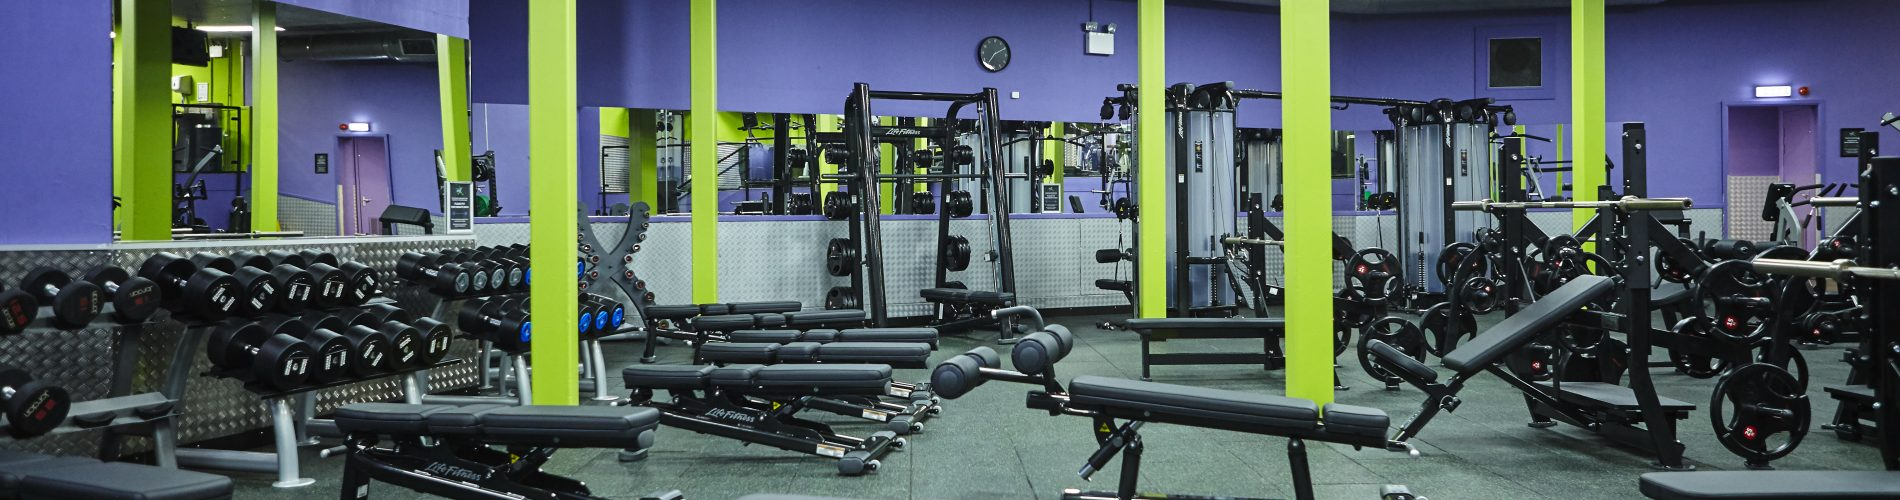 Simply Gym Uxbridge